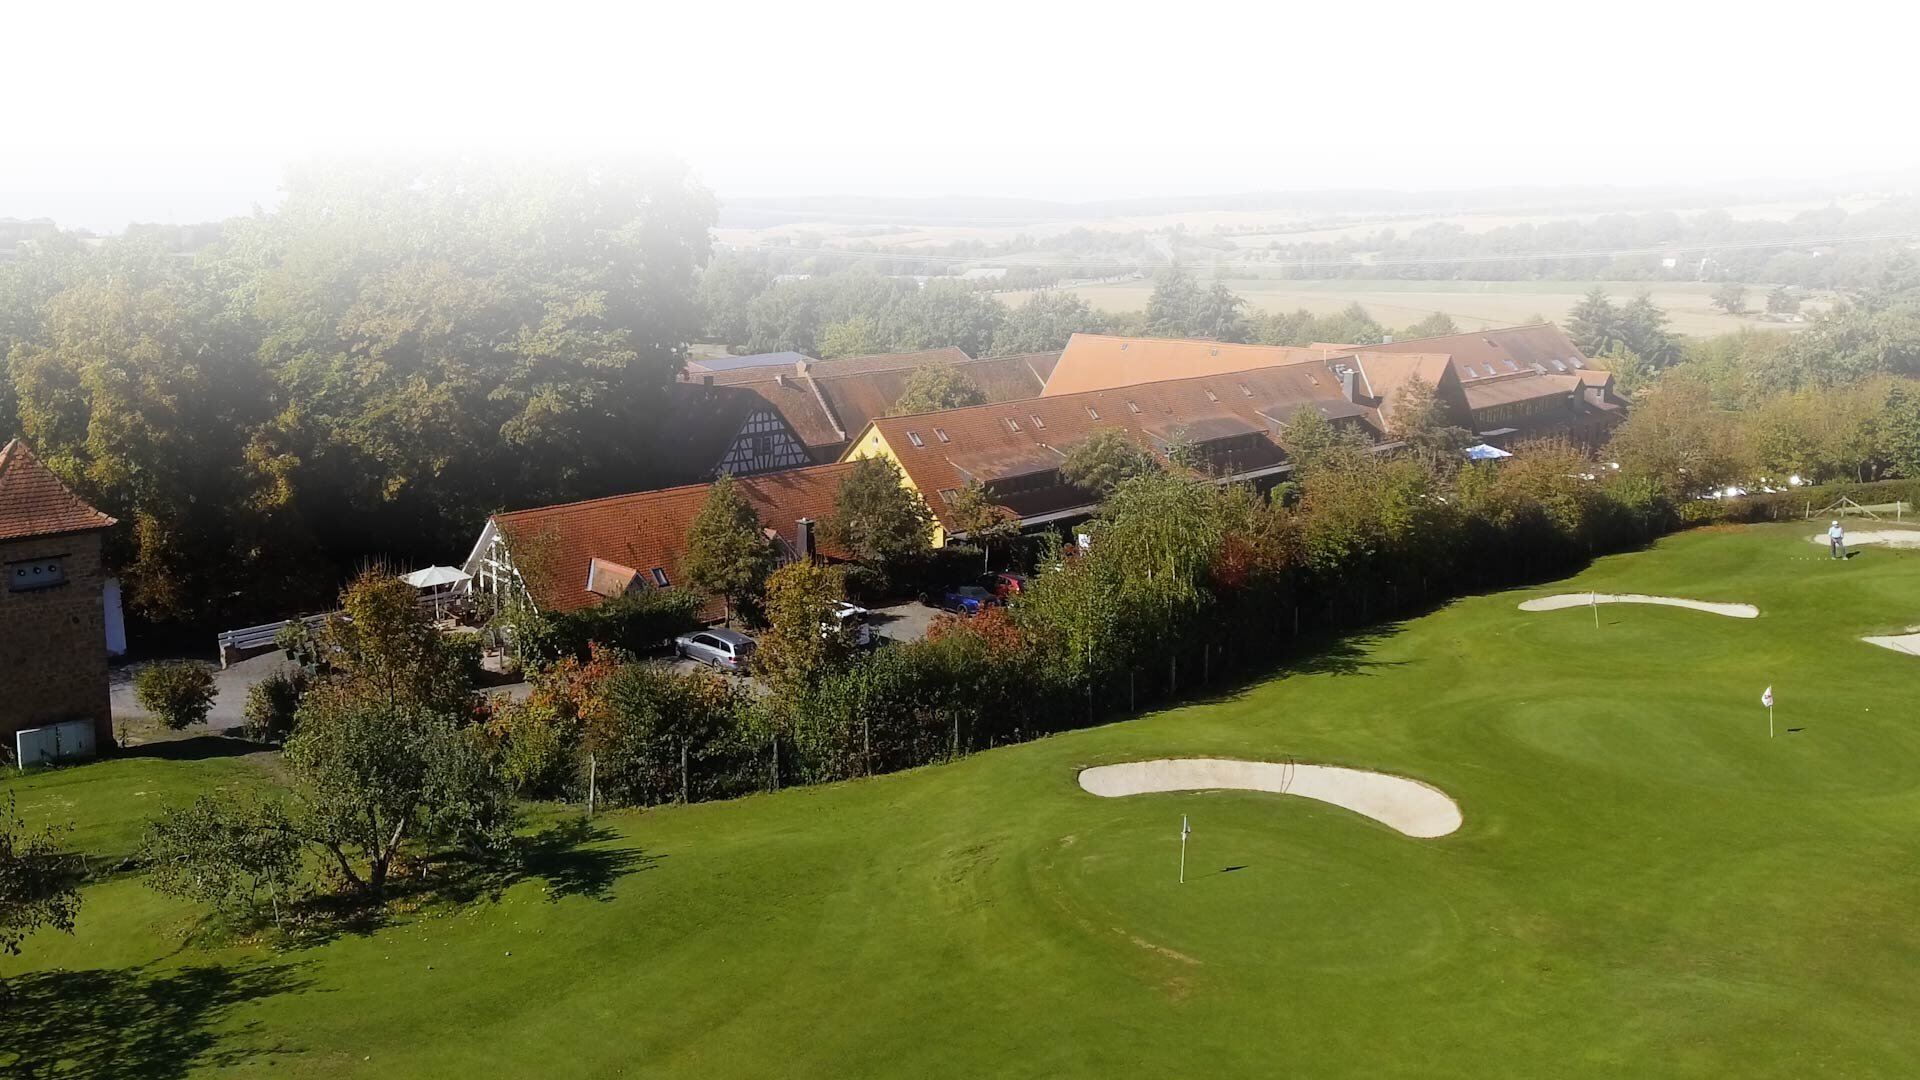 Gut Hühnerhof Luftbild Golfplatz